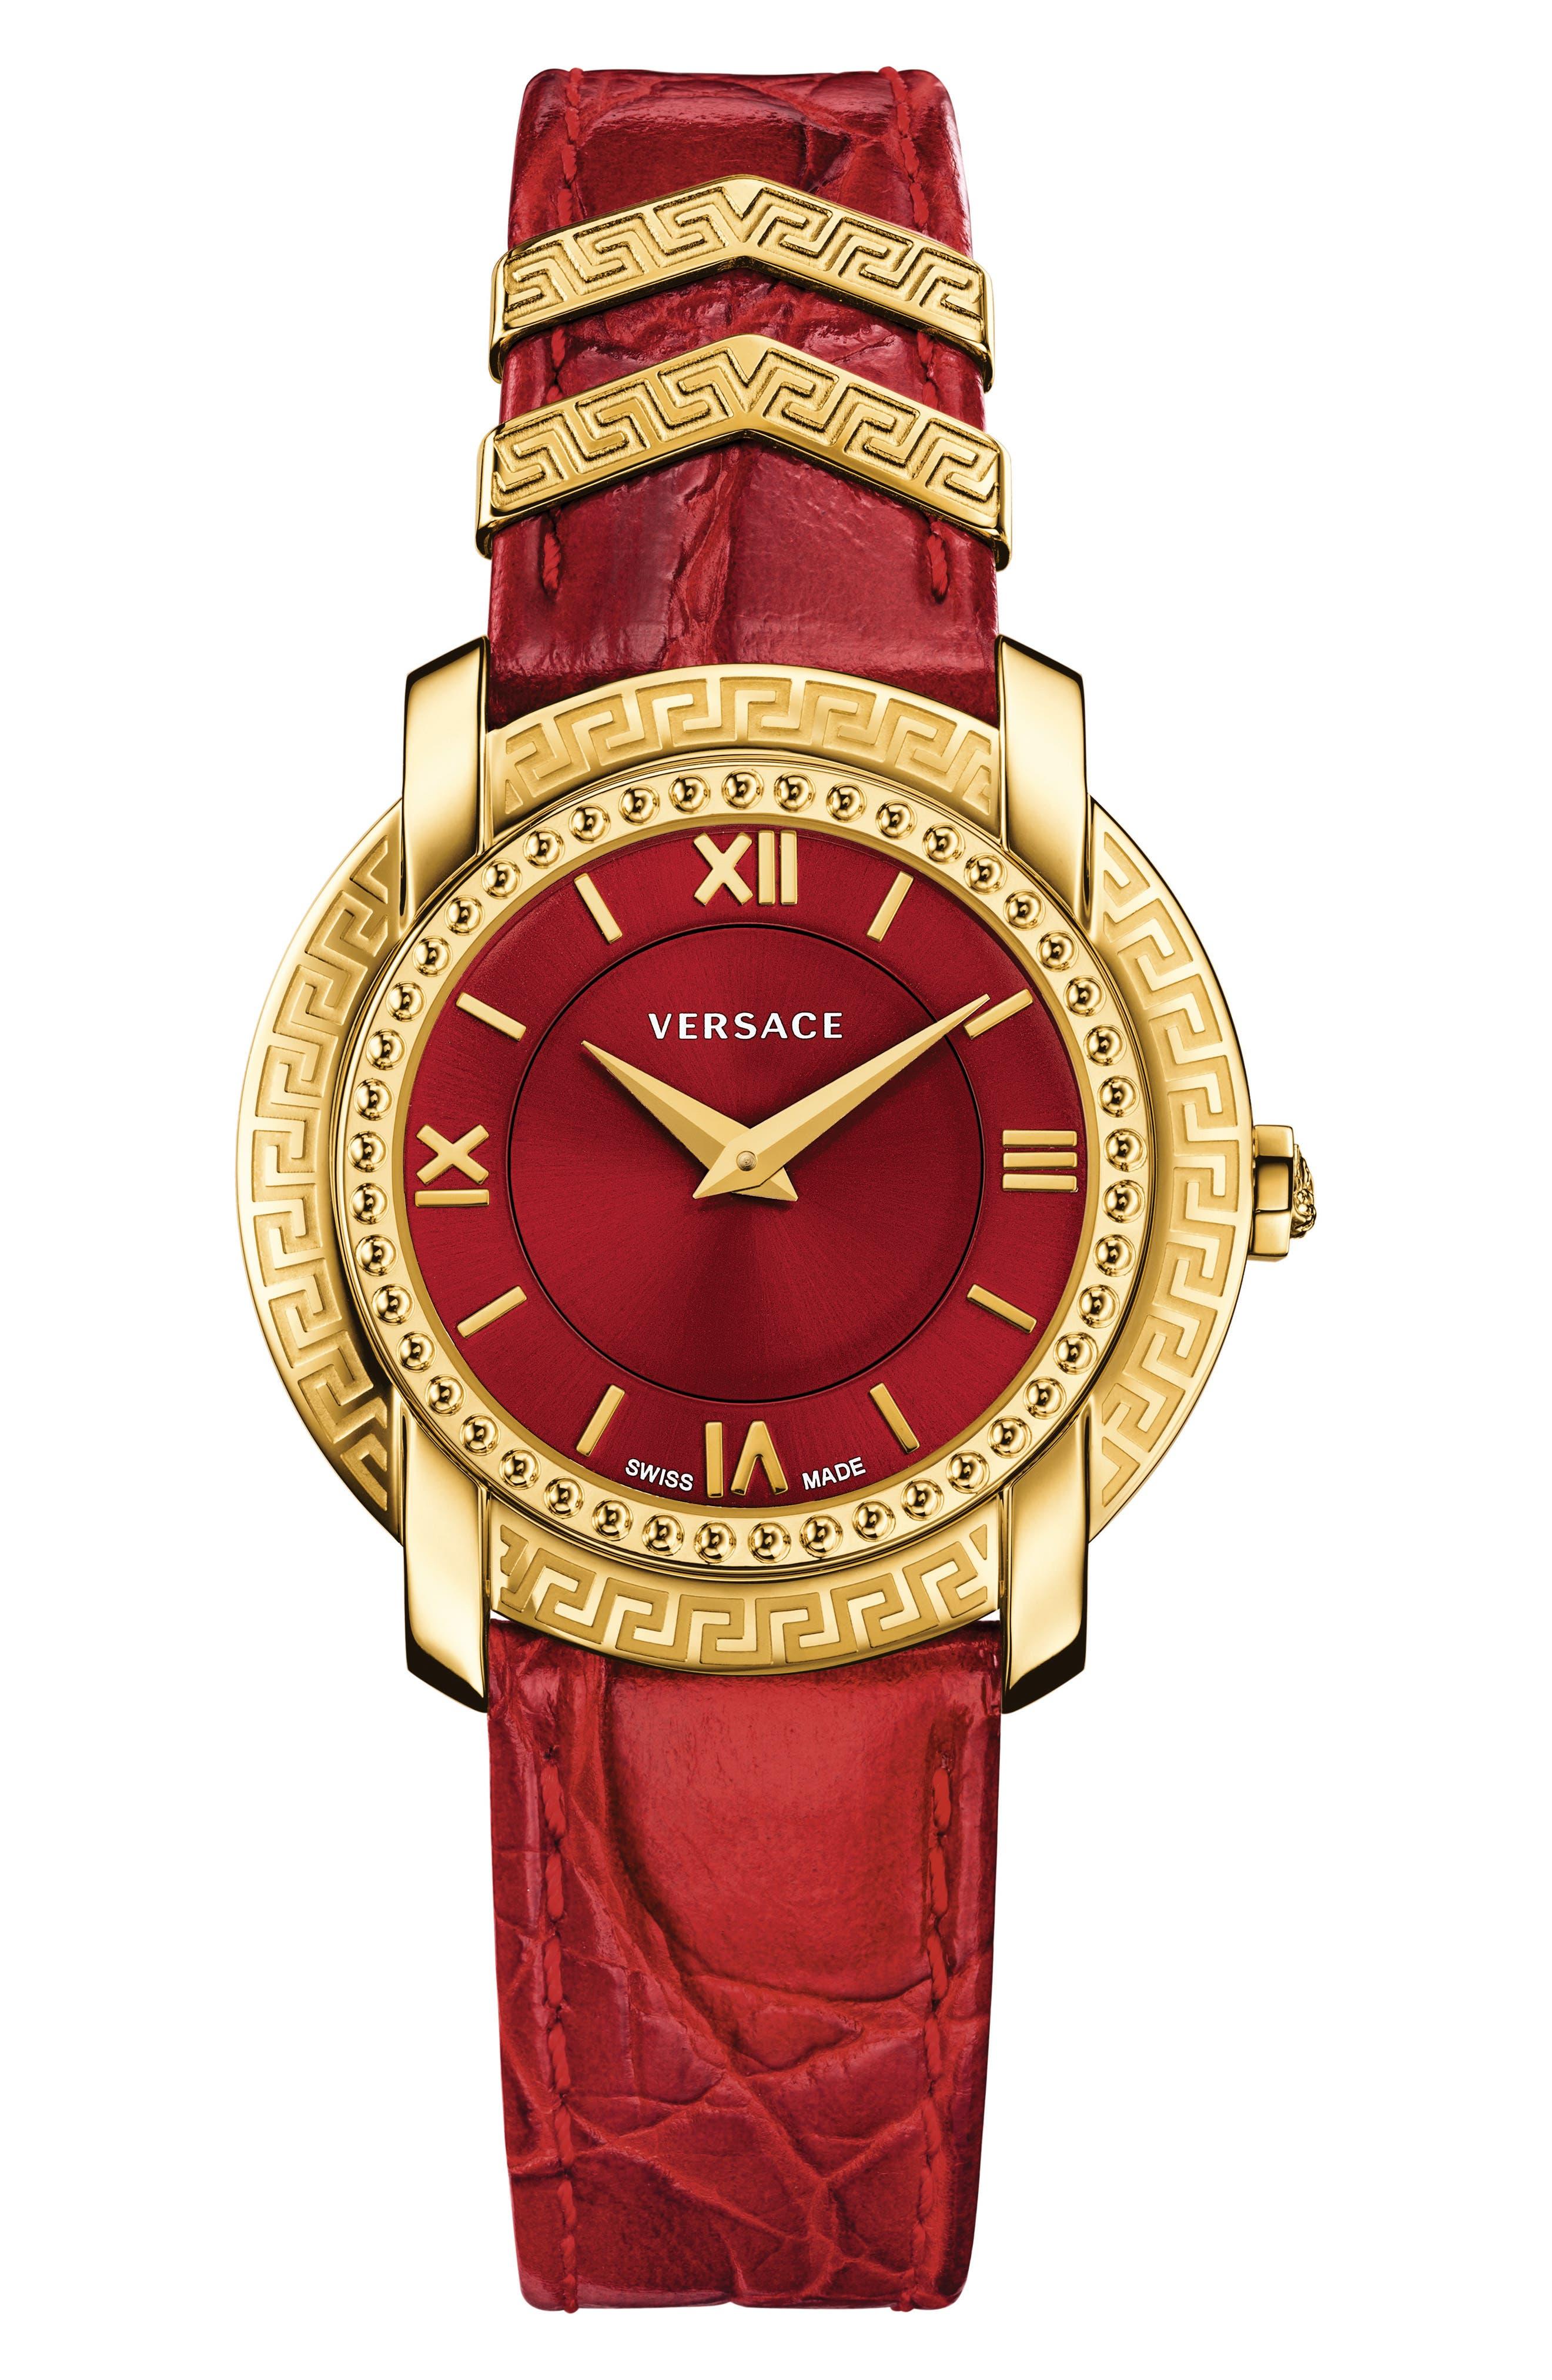 Versace DV-25 Leather Strap Watch, 36mm